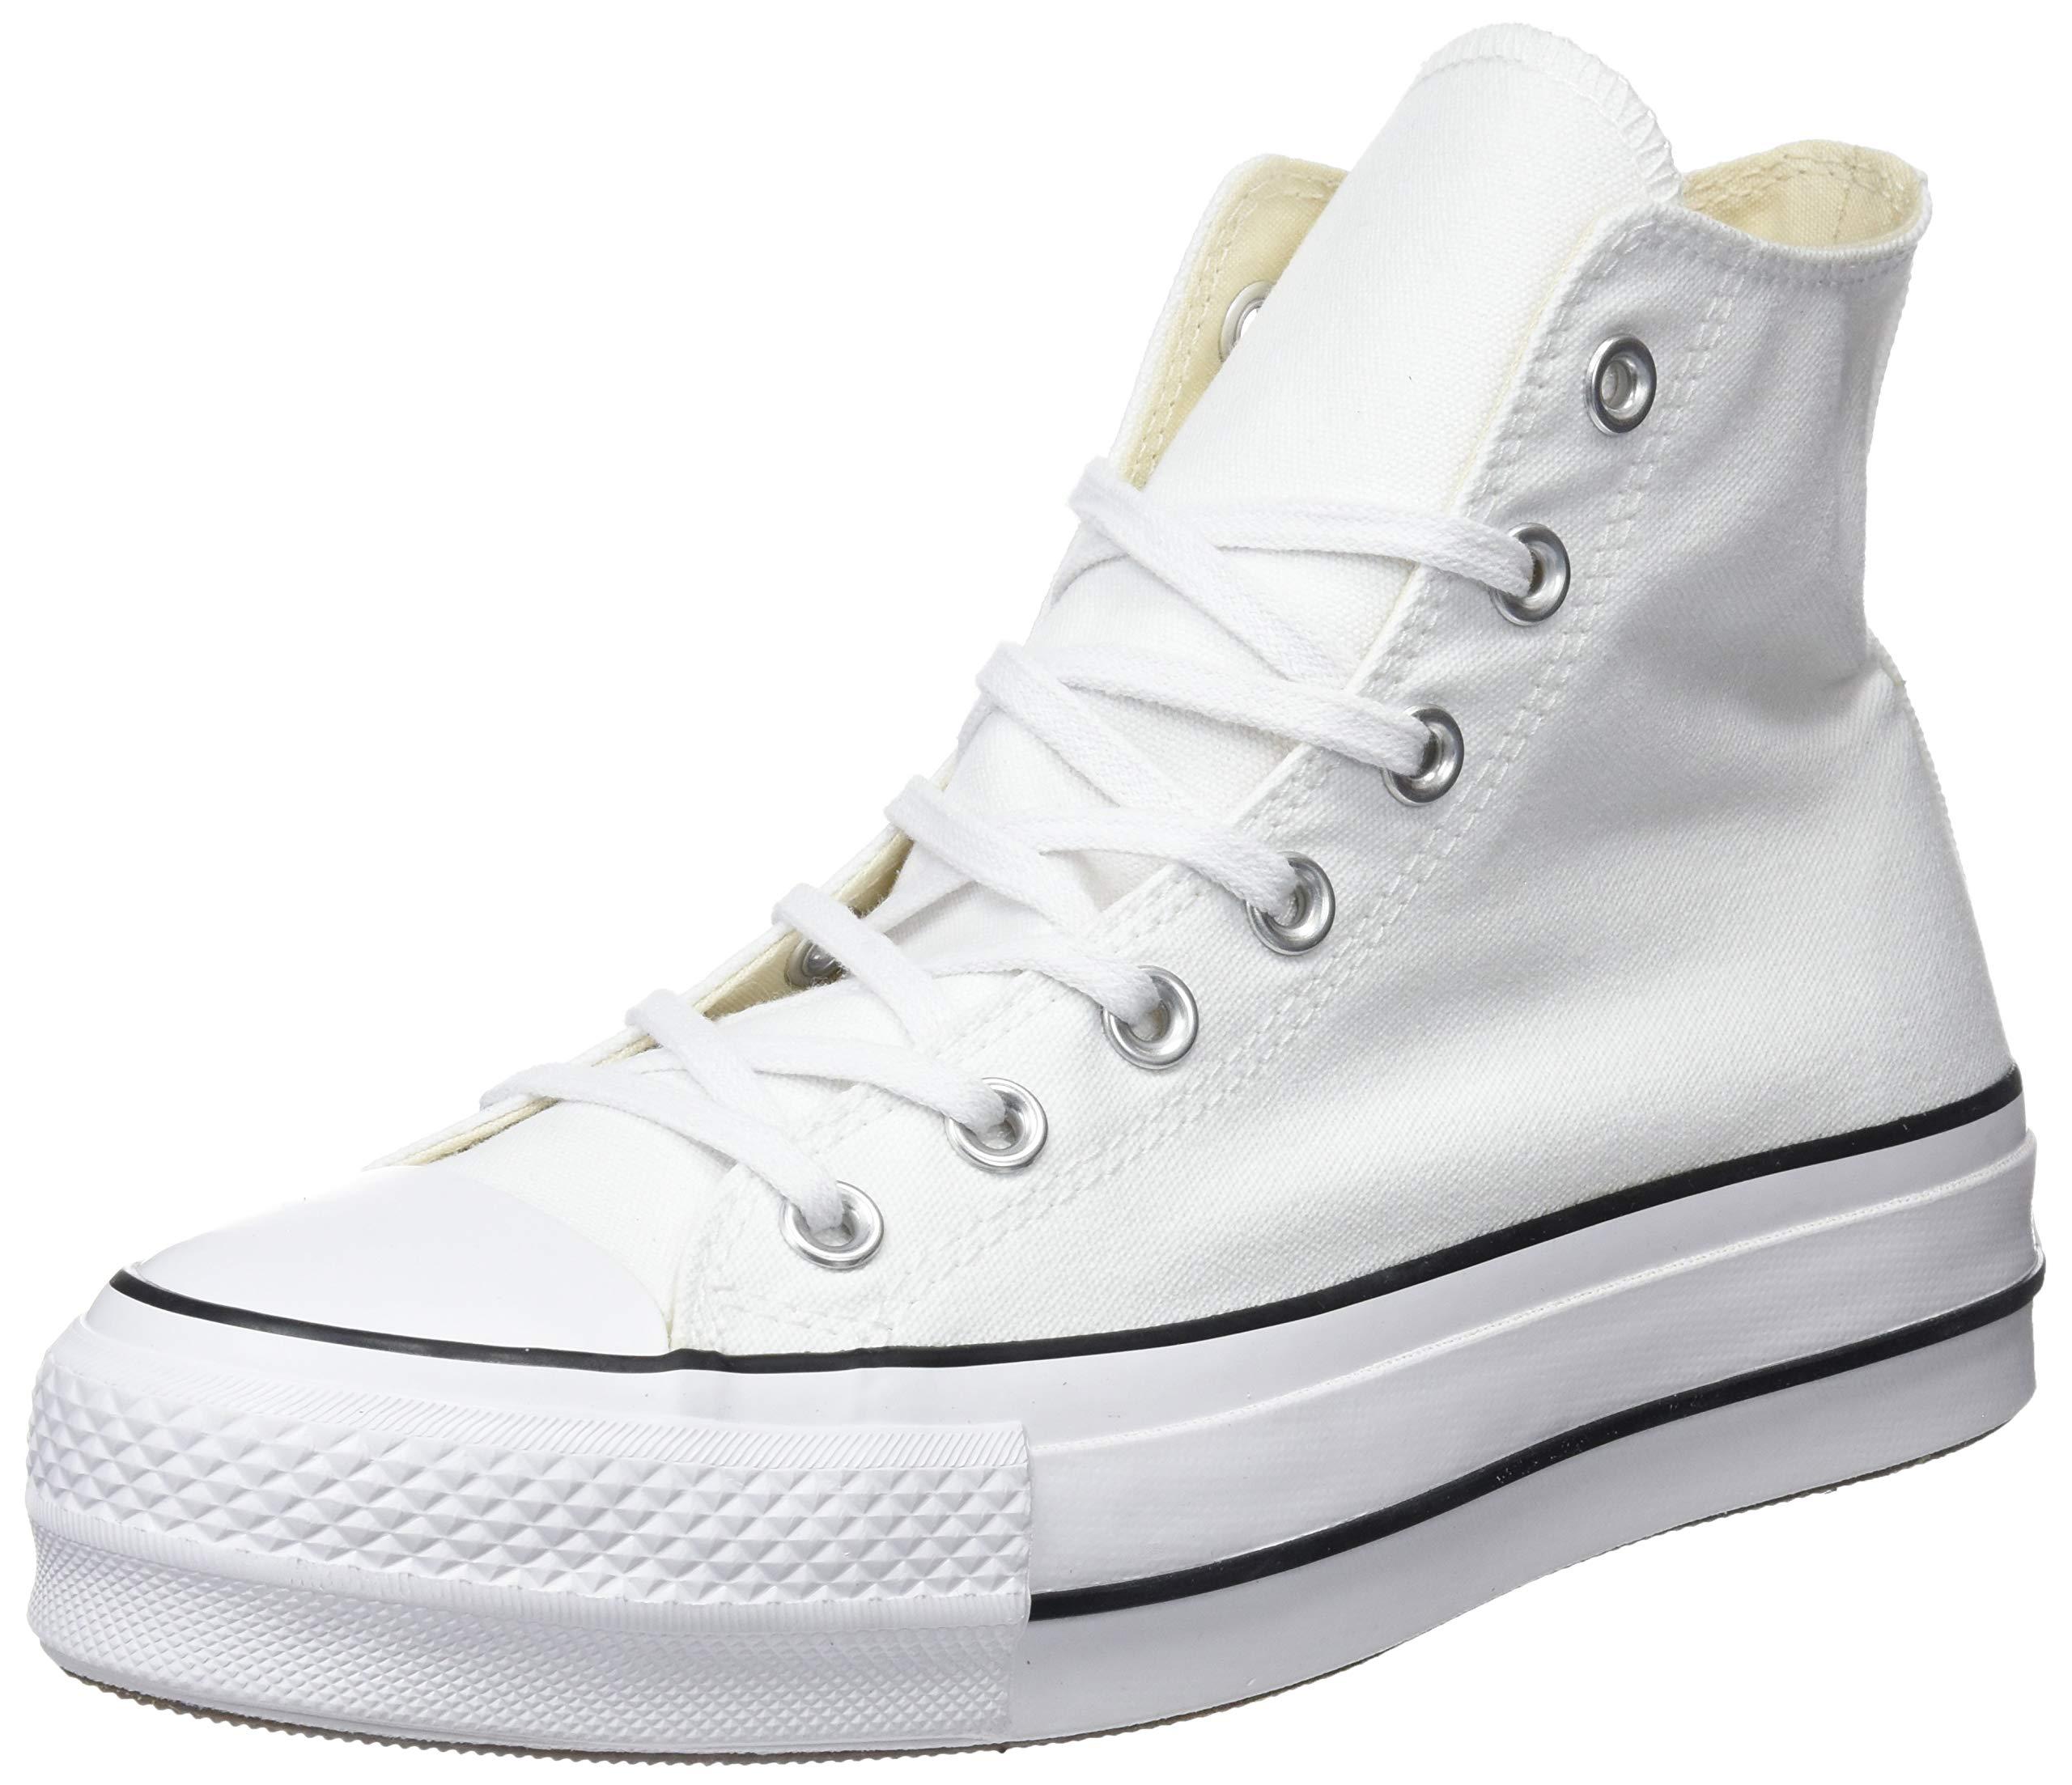 28be095f5 Mejor valorados en Zapatos para niñas pequeñas   Opiniones útiles de ...